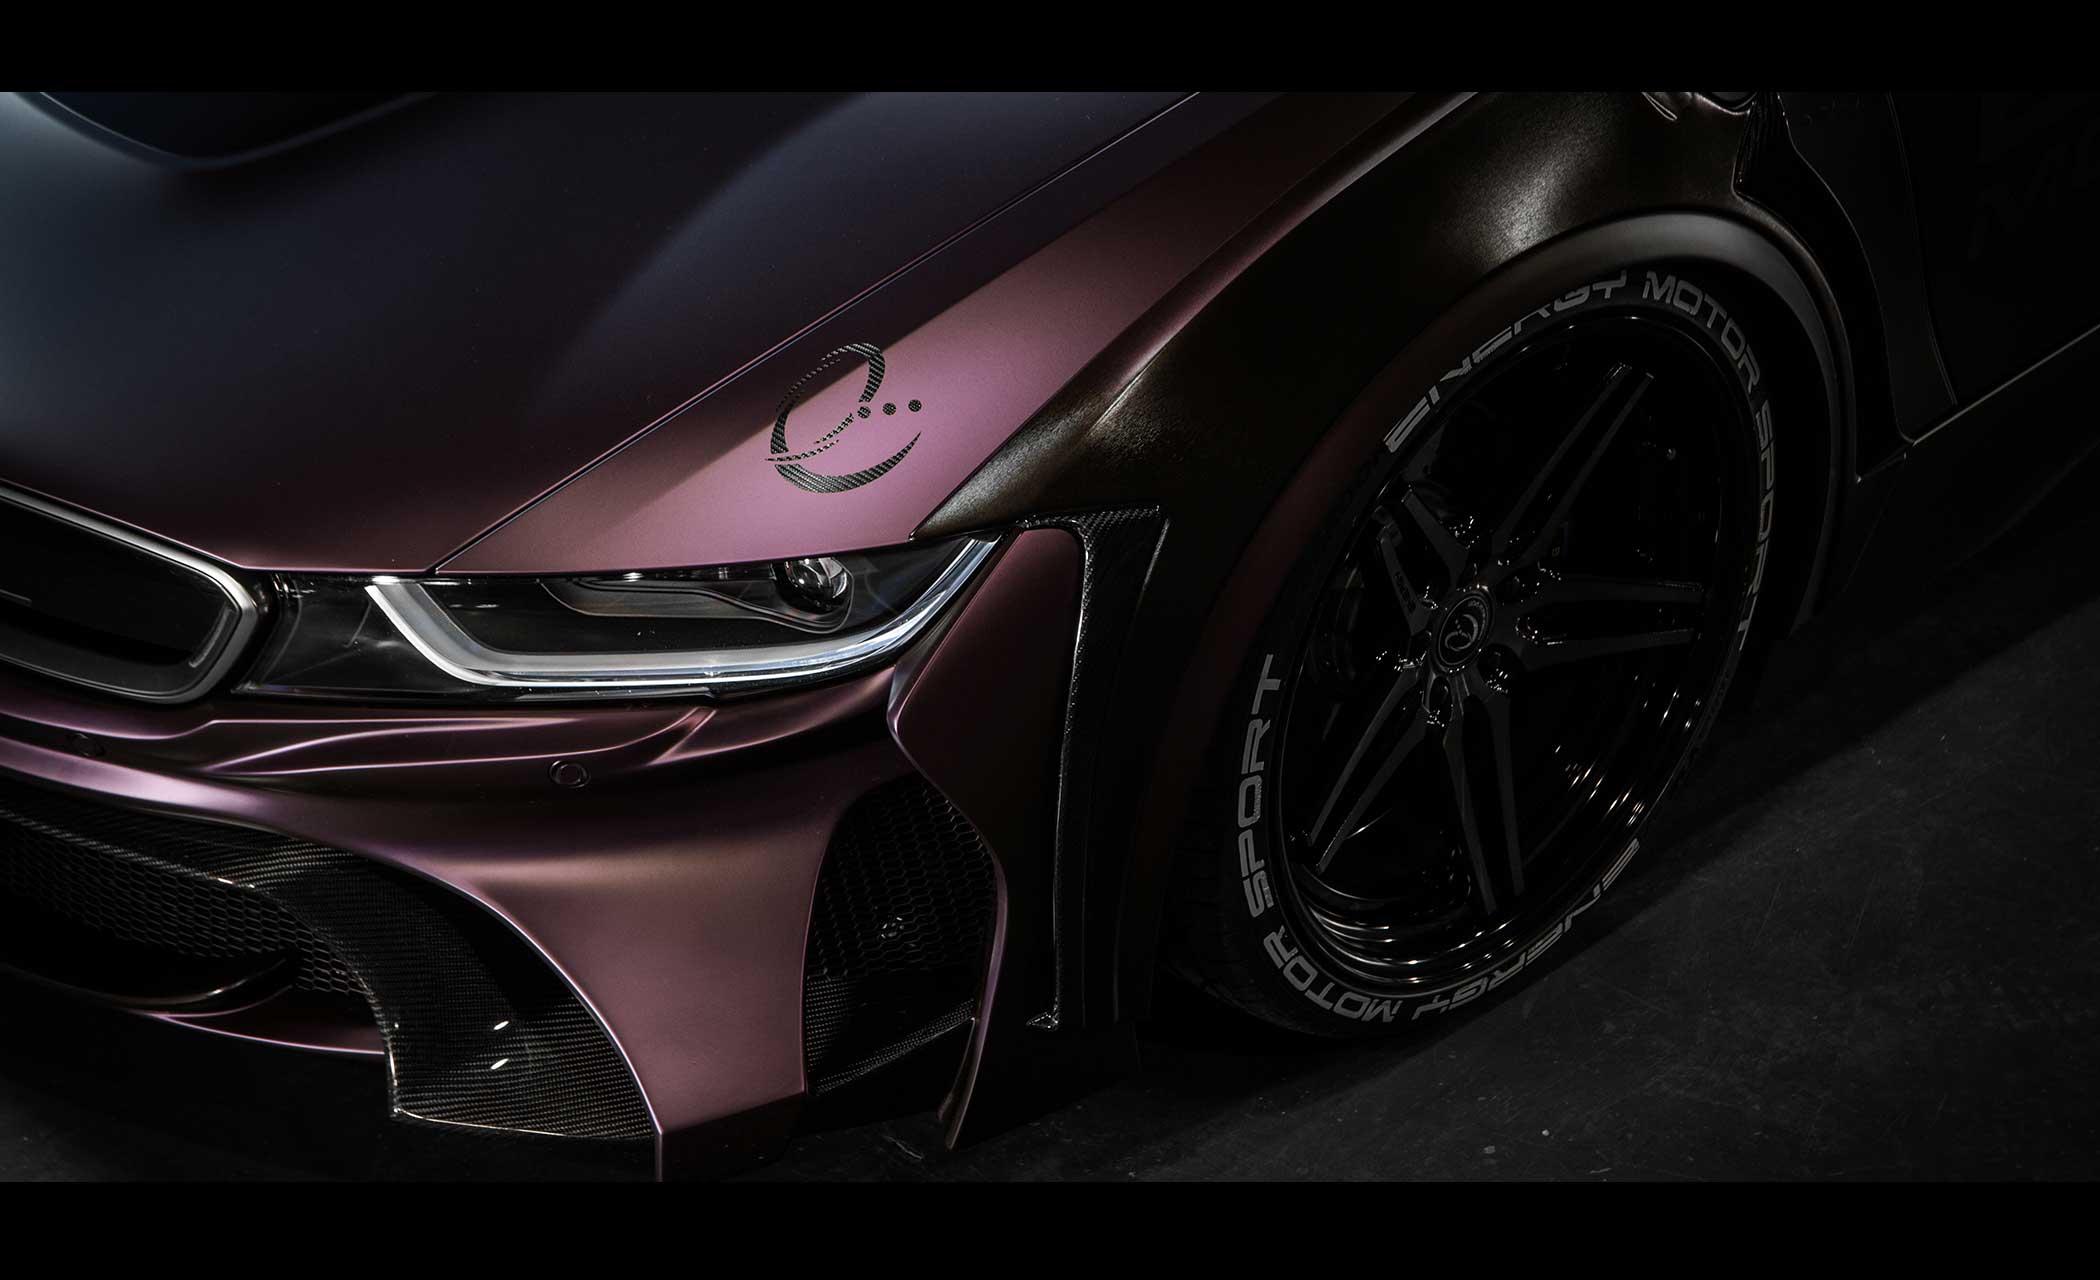 Energy Motorsport - BMW i8 Dark Knight Edition - 2017 - wheel